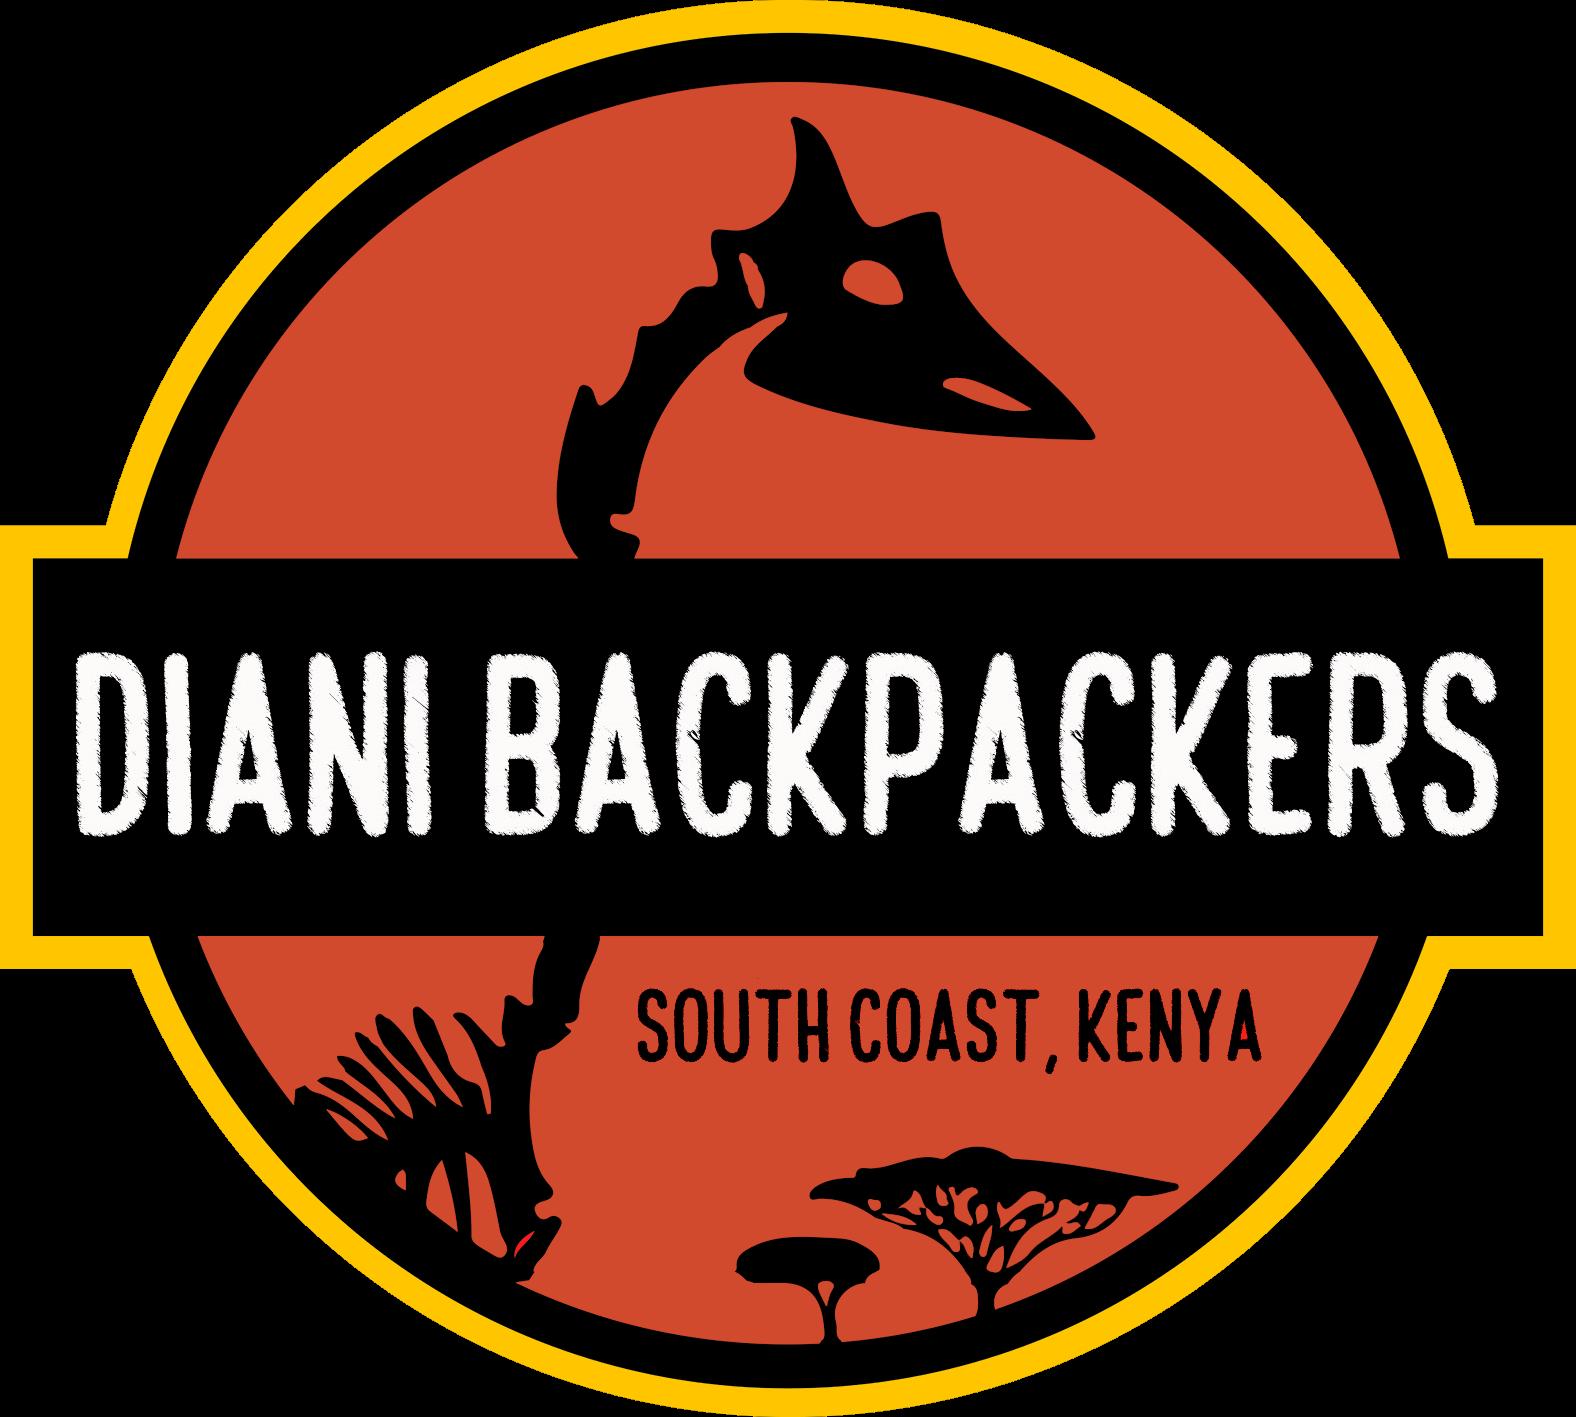 Diani Backpackers logo